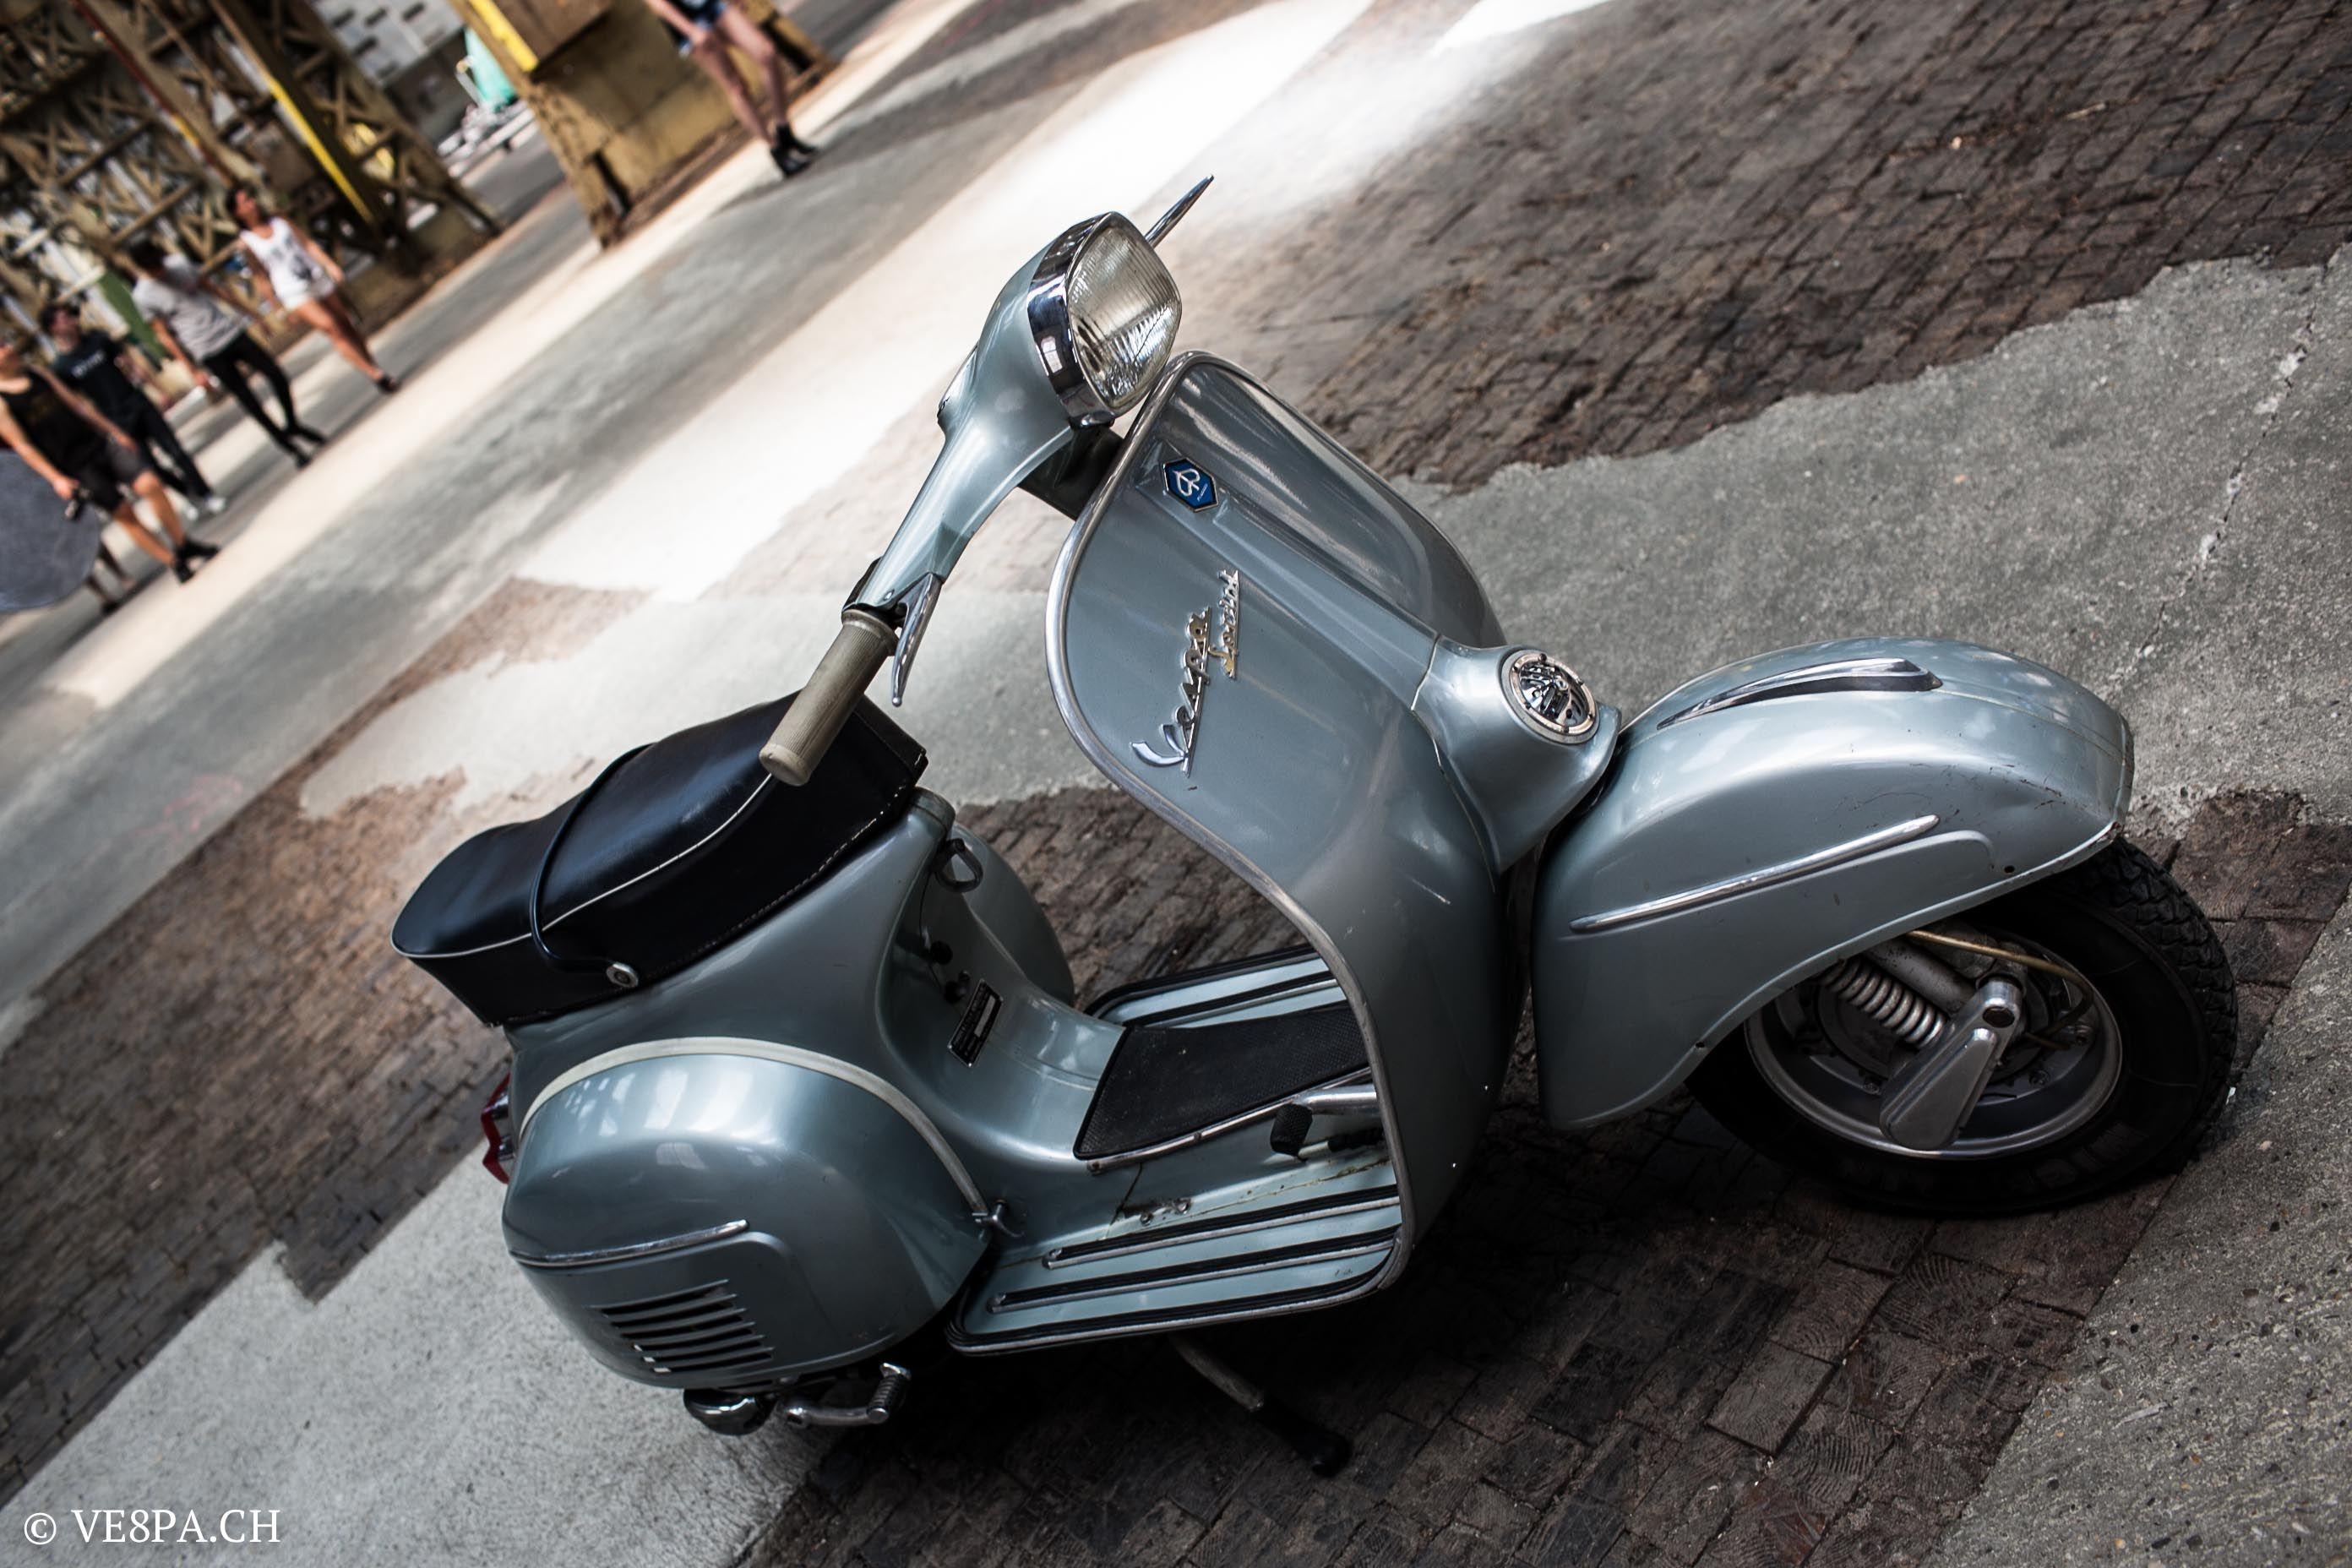 pin von b lee auf wheels vespa motor scooters vespa. Black Bedroom Furniture Sets. Home Design Ideas